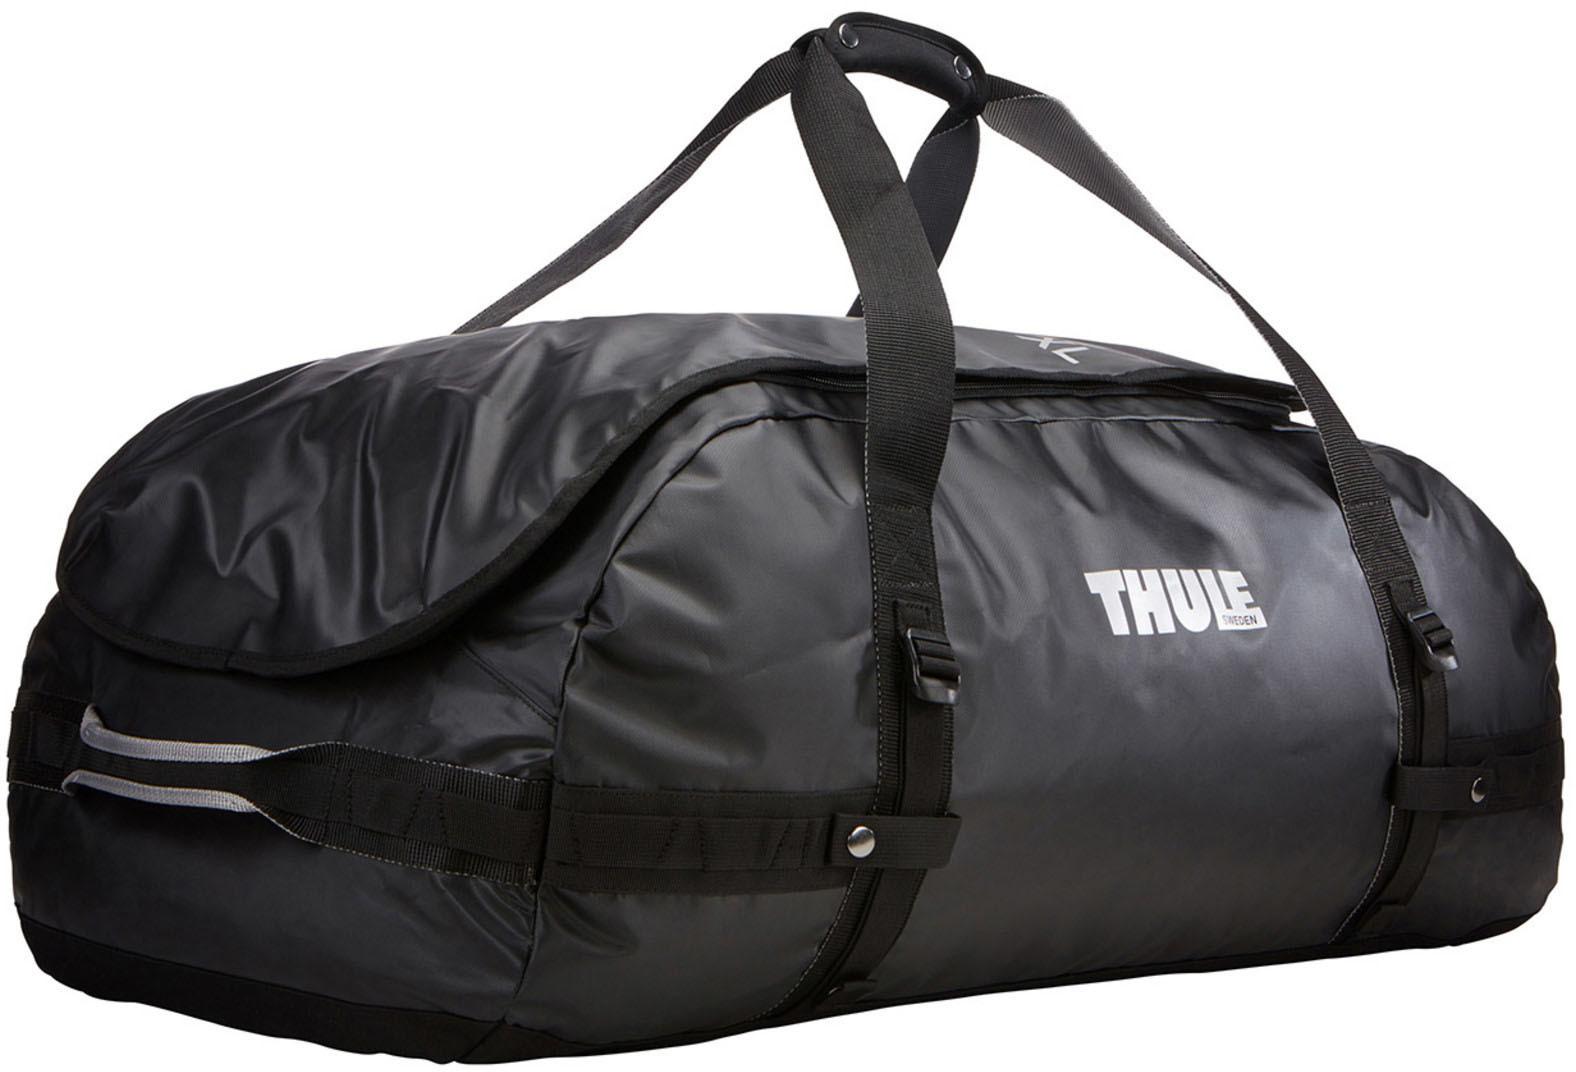 Thule Chasm Сумка спортивная Thule Chasm XL-130L 538210_sized_1800x1200_rev_1.jpg